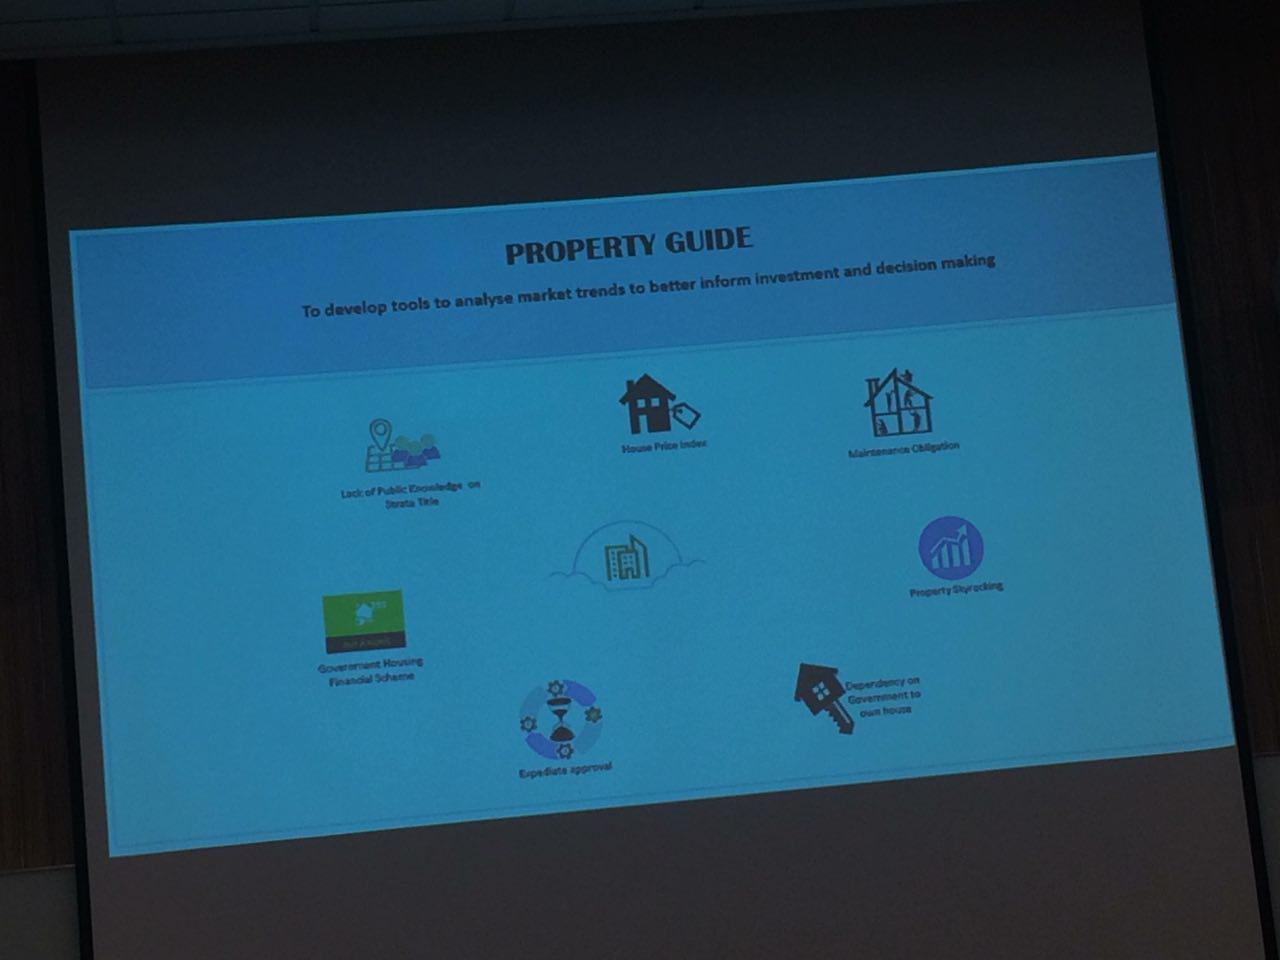 property guide.jpg